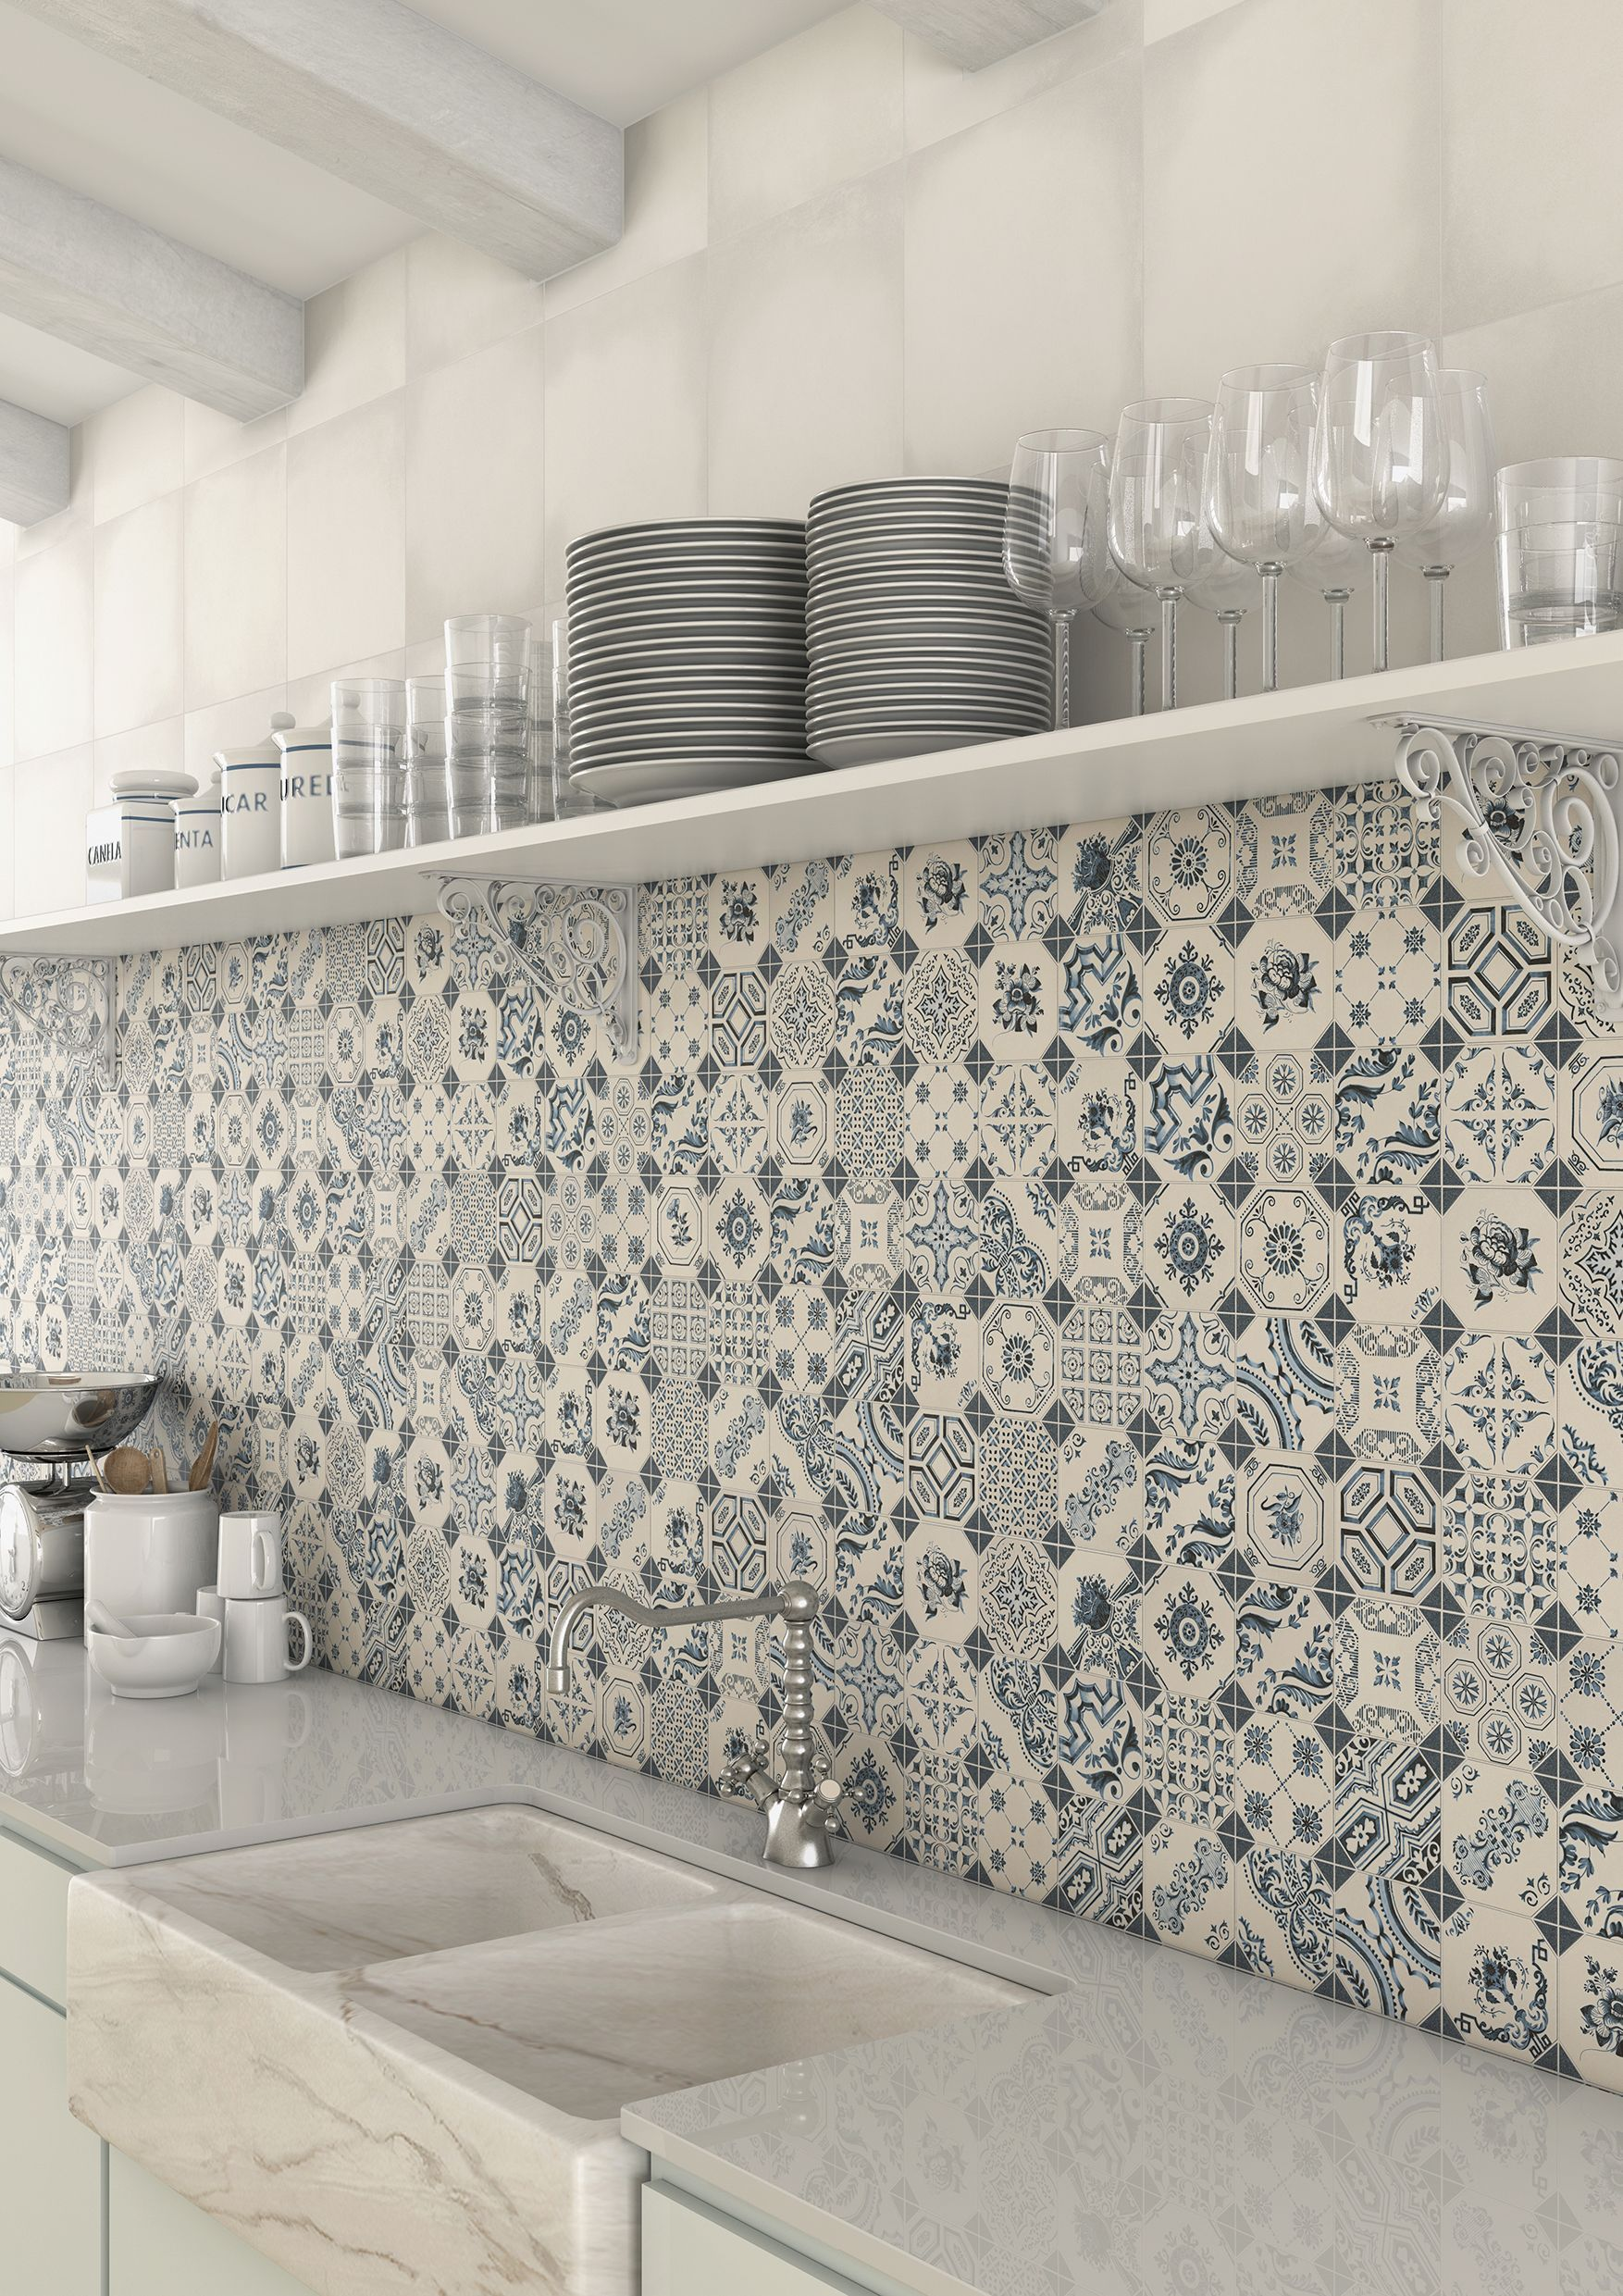 How To Cut Decorative Tile Portugal Retro  Kitchens Portugal And Monochrome Interior